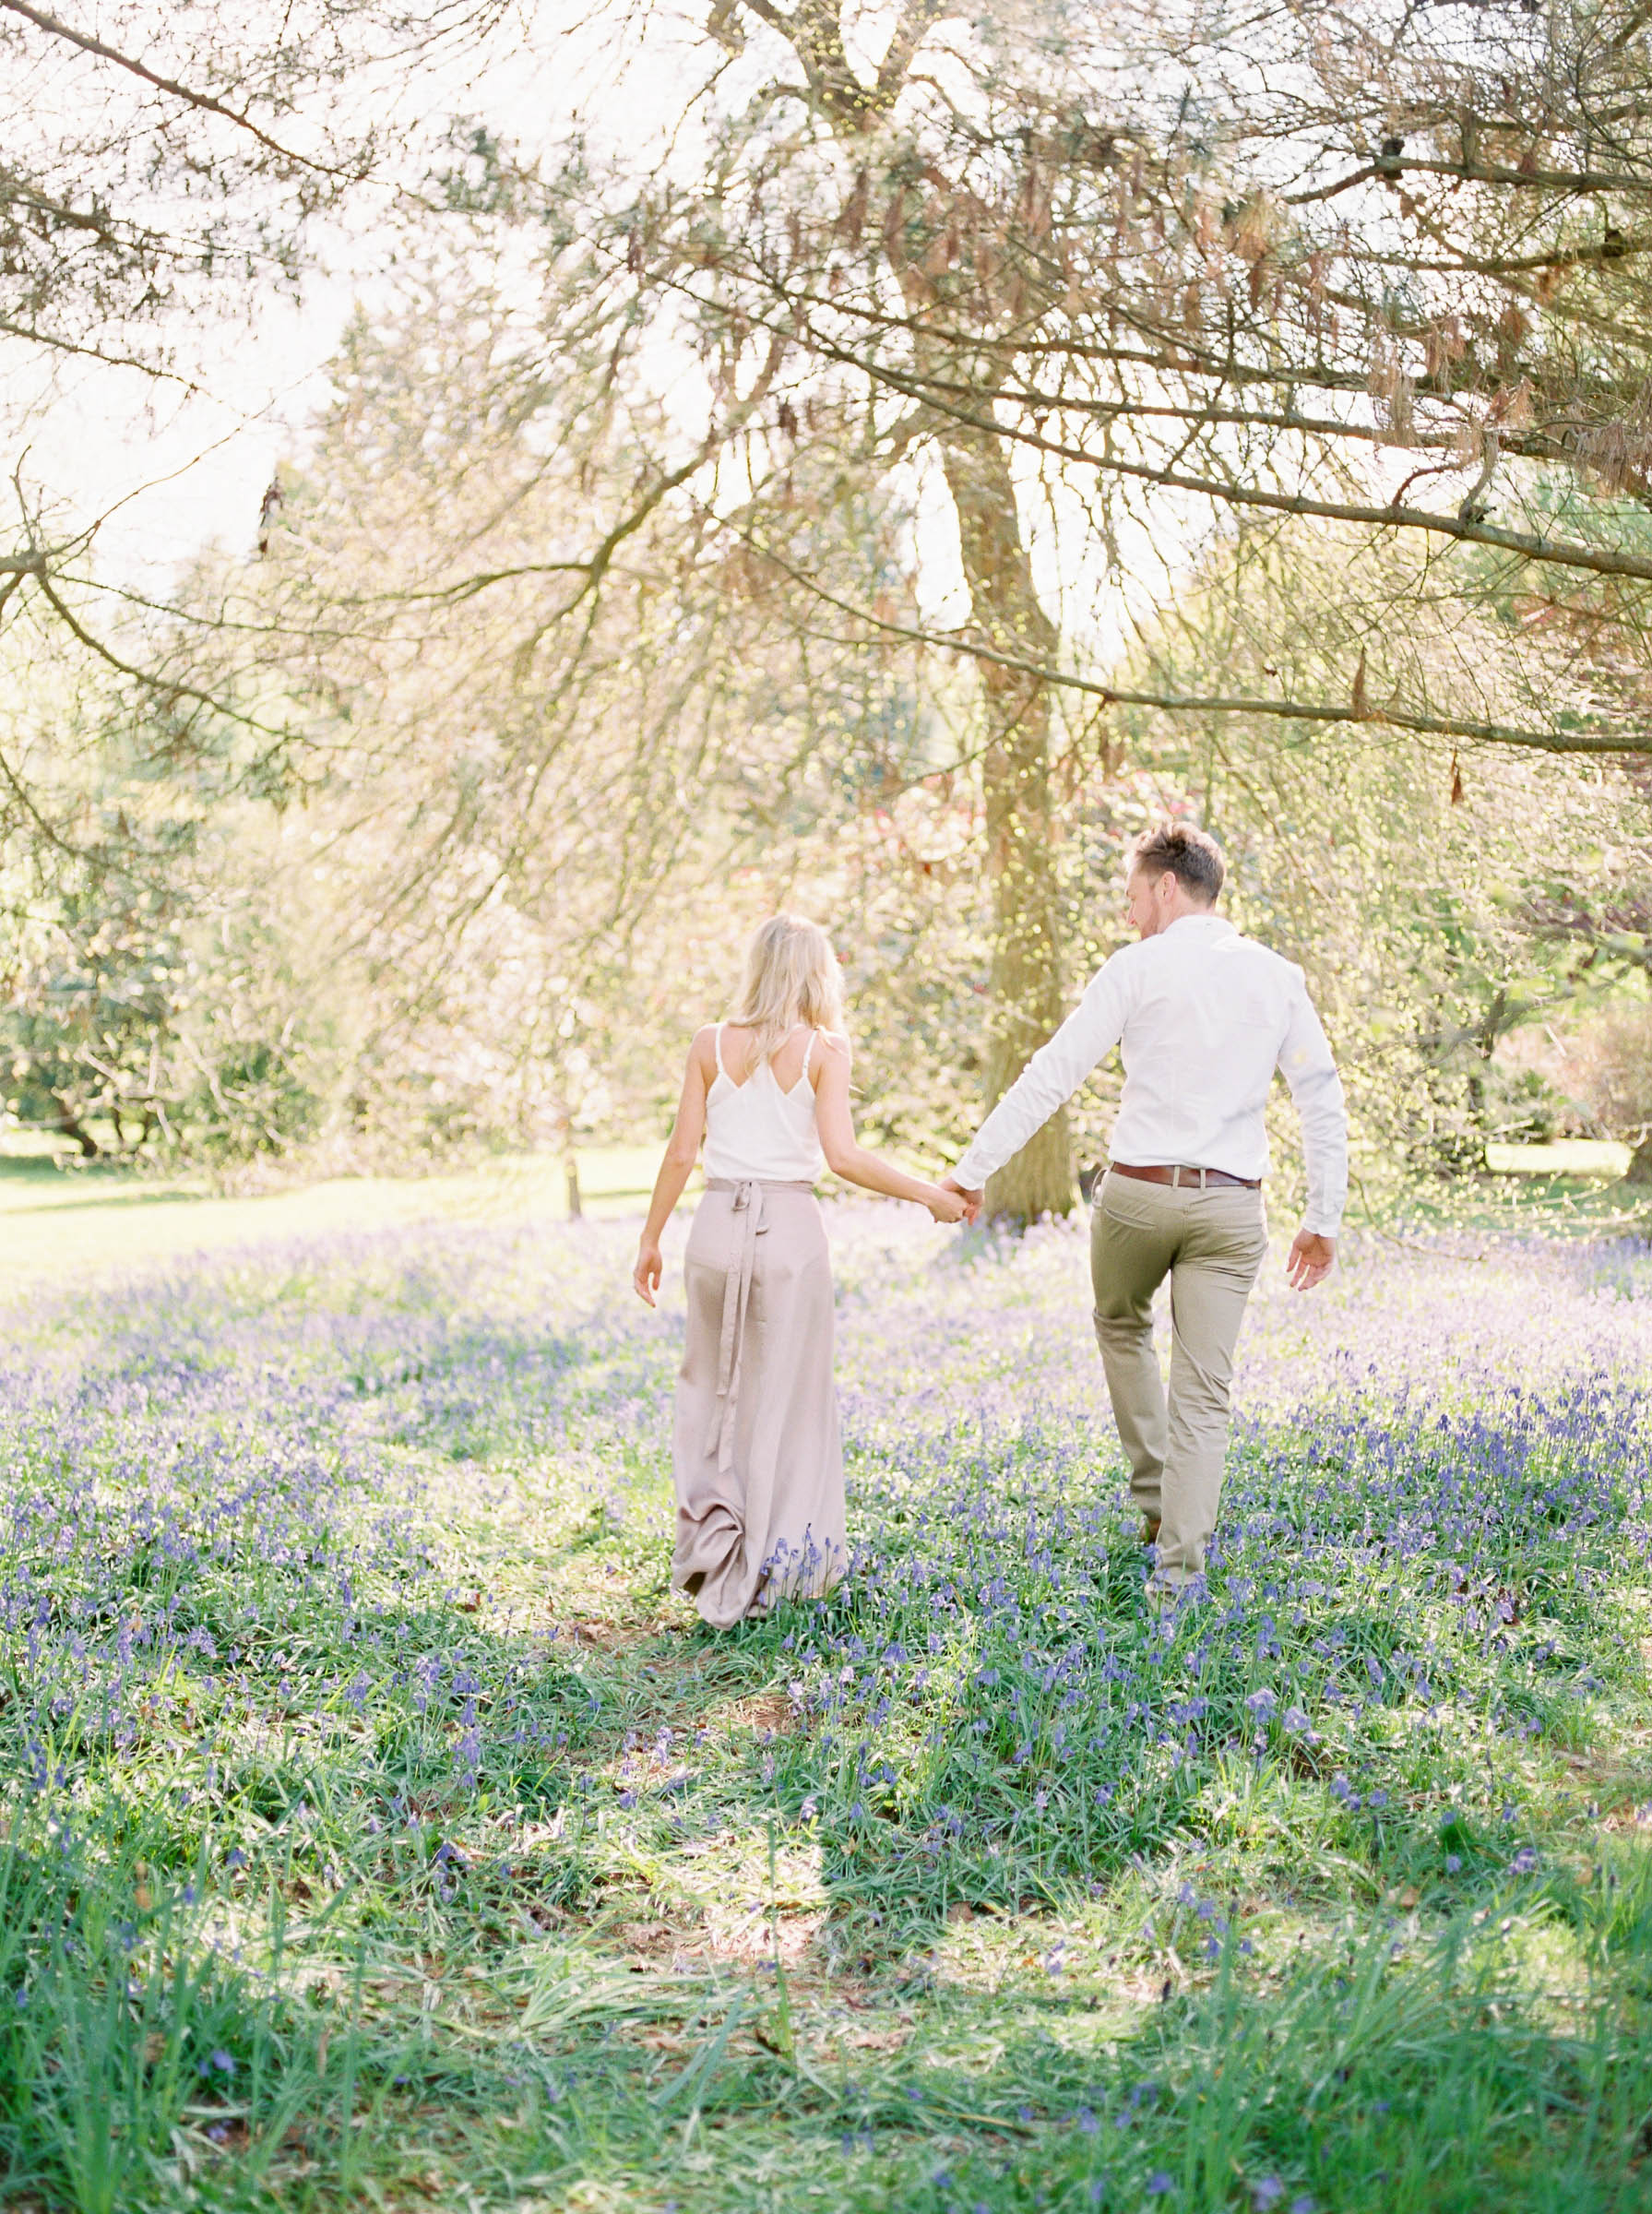 Amy O'Boyle Photography- Destination & UK Fine Art Film Wedding Photographer- Sheffield Park Garden National Trust Spring Engagement Shoot-9.jpg